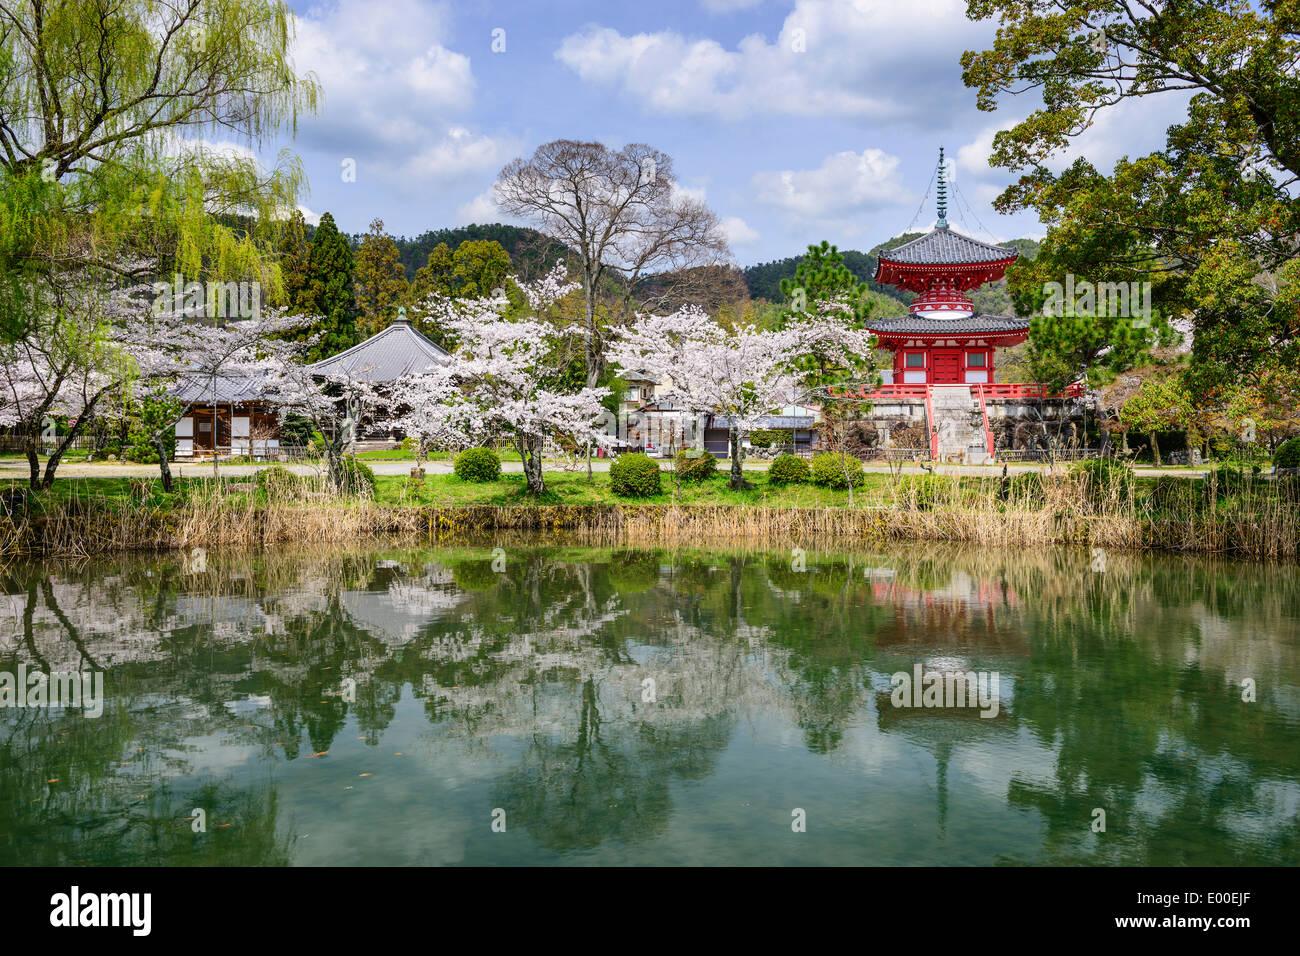 Daikoku-ji, en Kyoto, Japón. Imagen De Stock